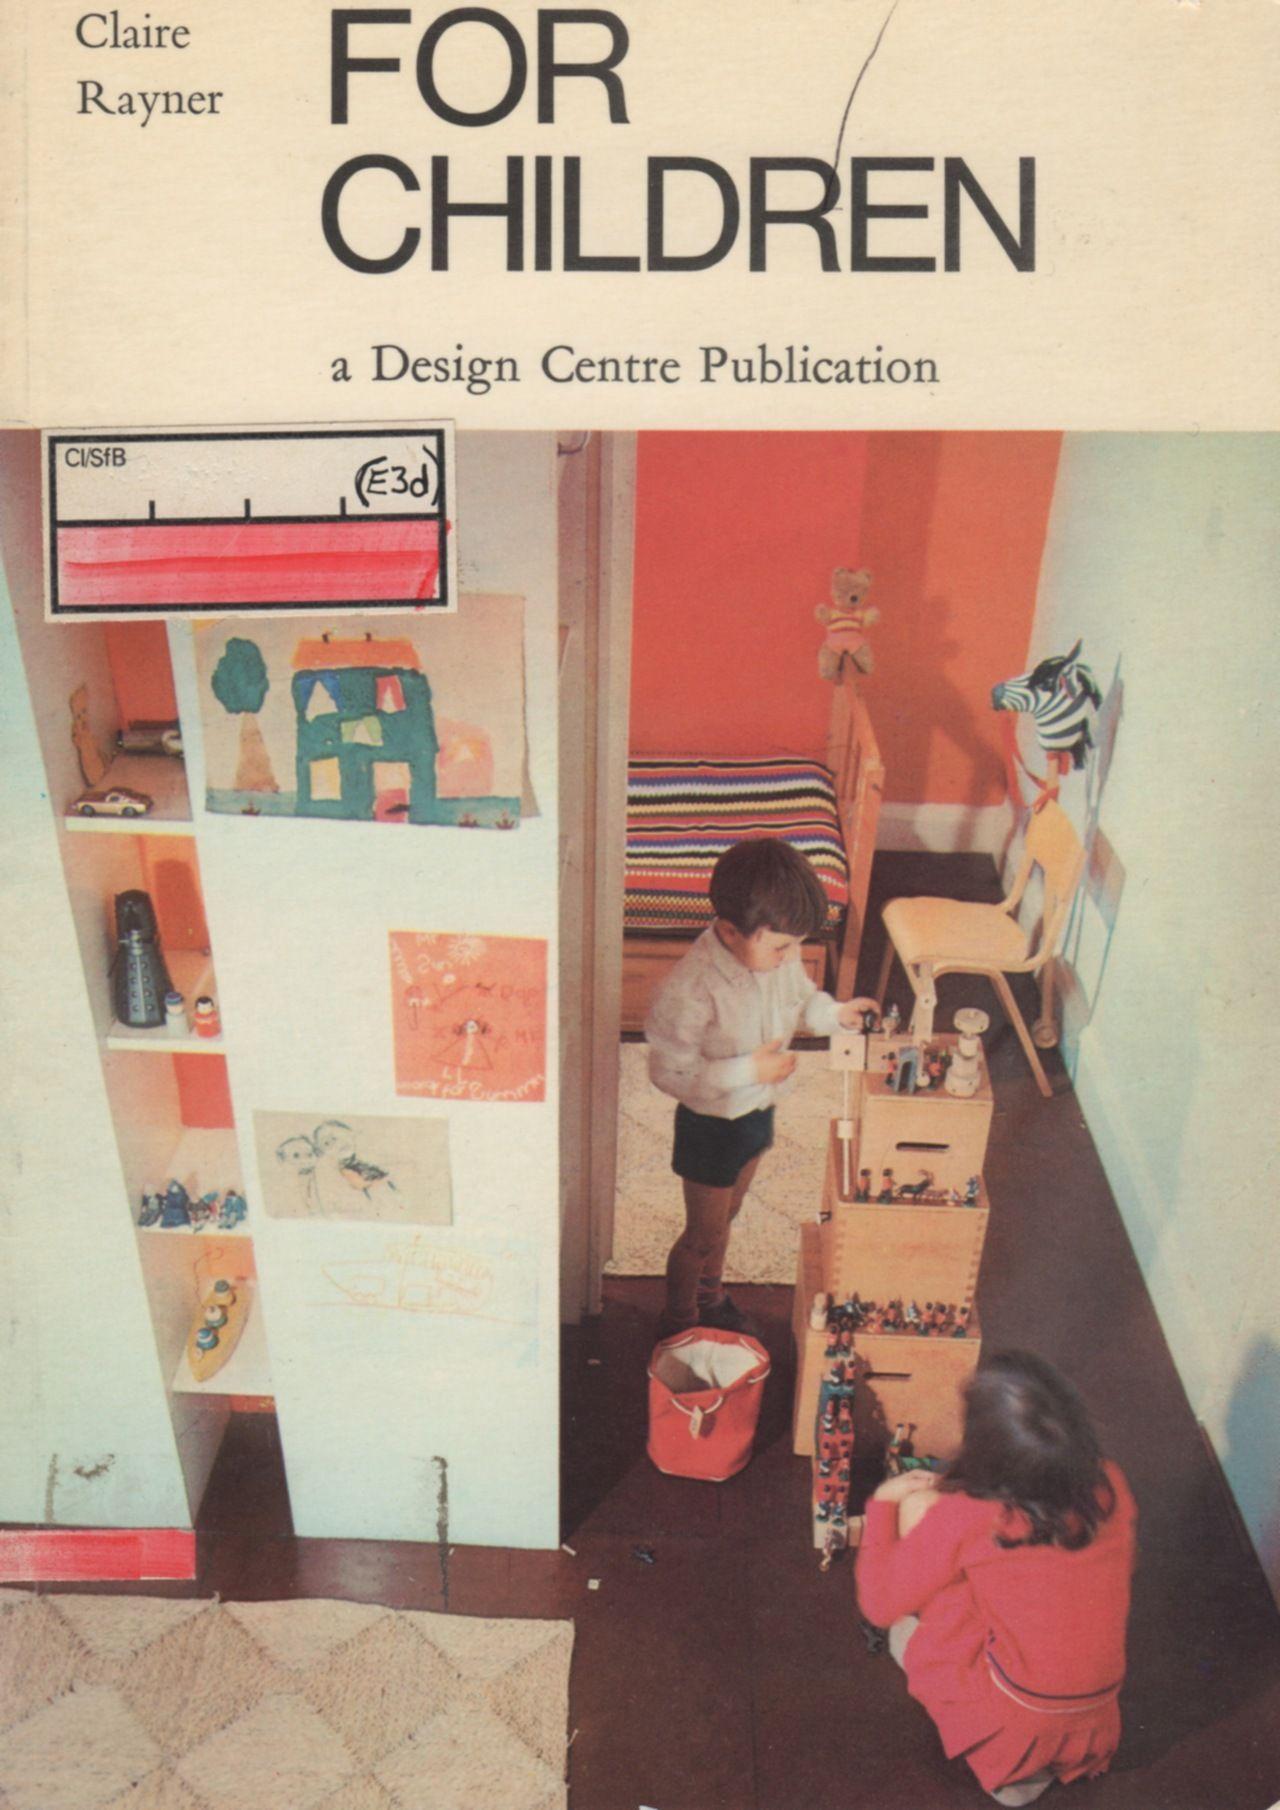 For Children By Claire Rayner A Design Centre Publication Macdonald Co 1967 Interior Design Books Children S Book Illustration Architecture Books